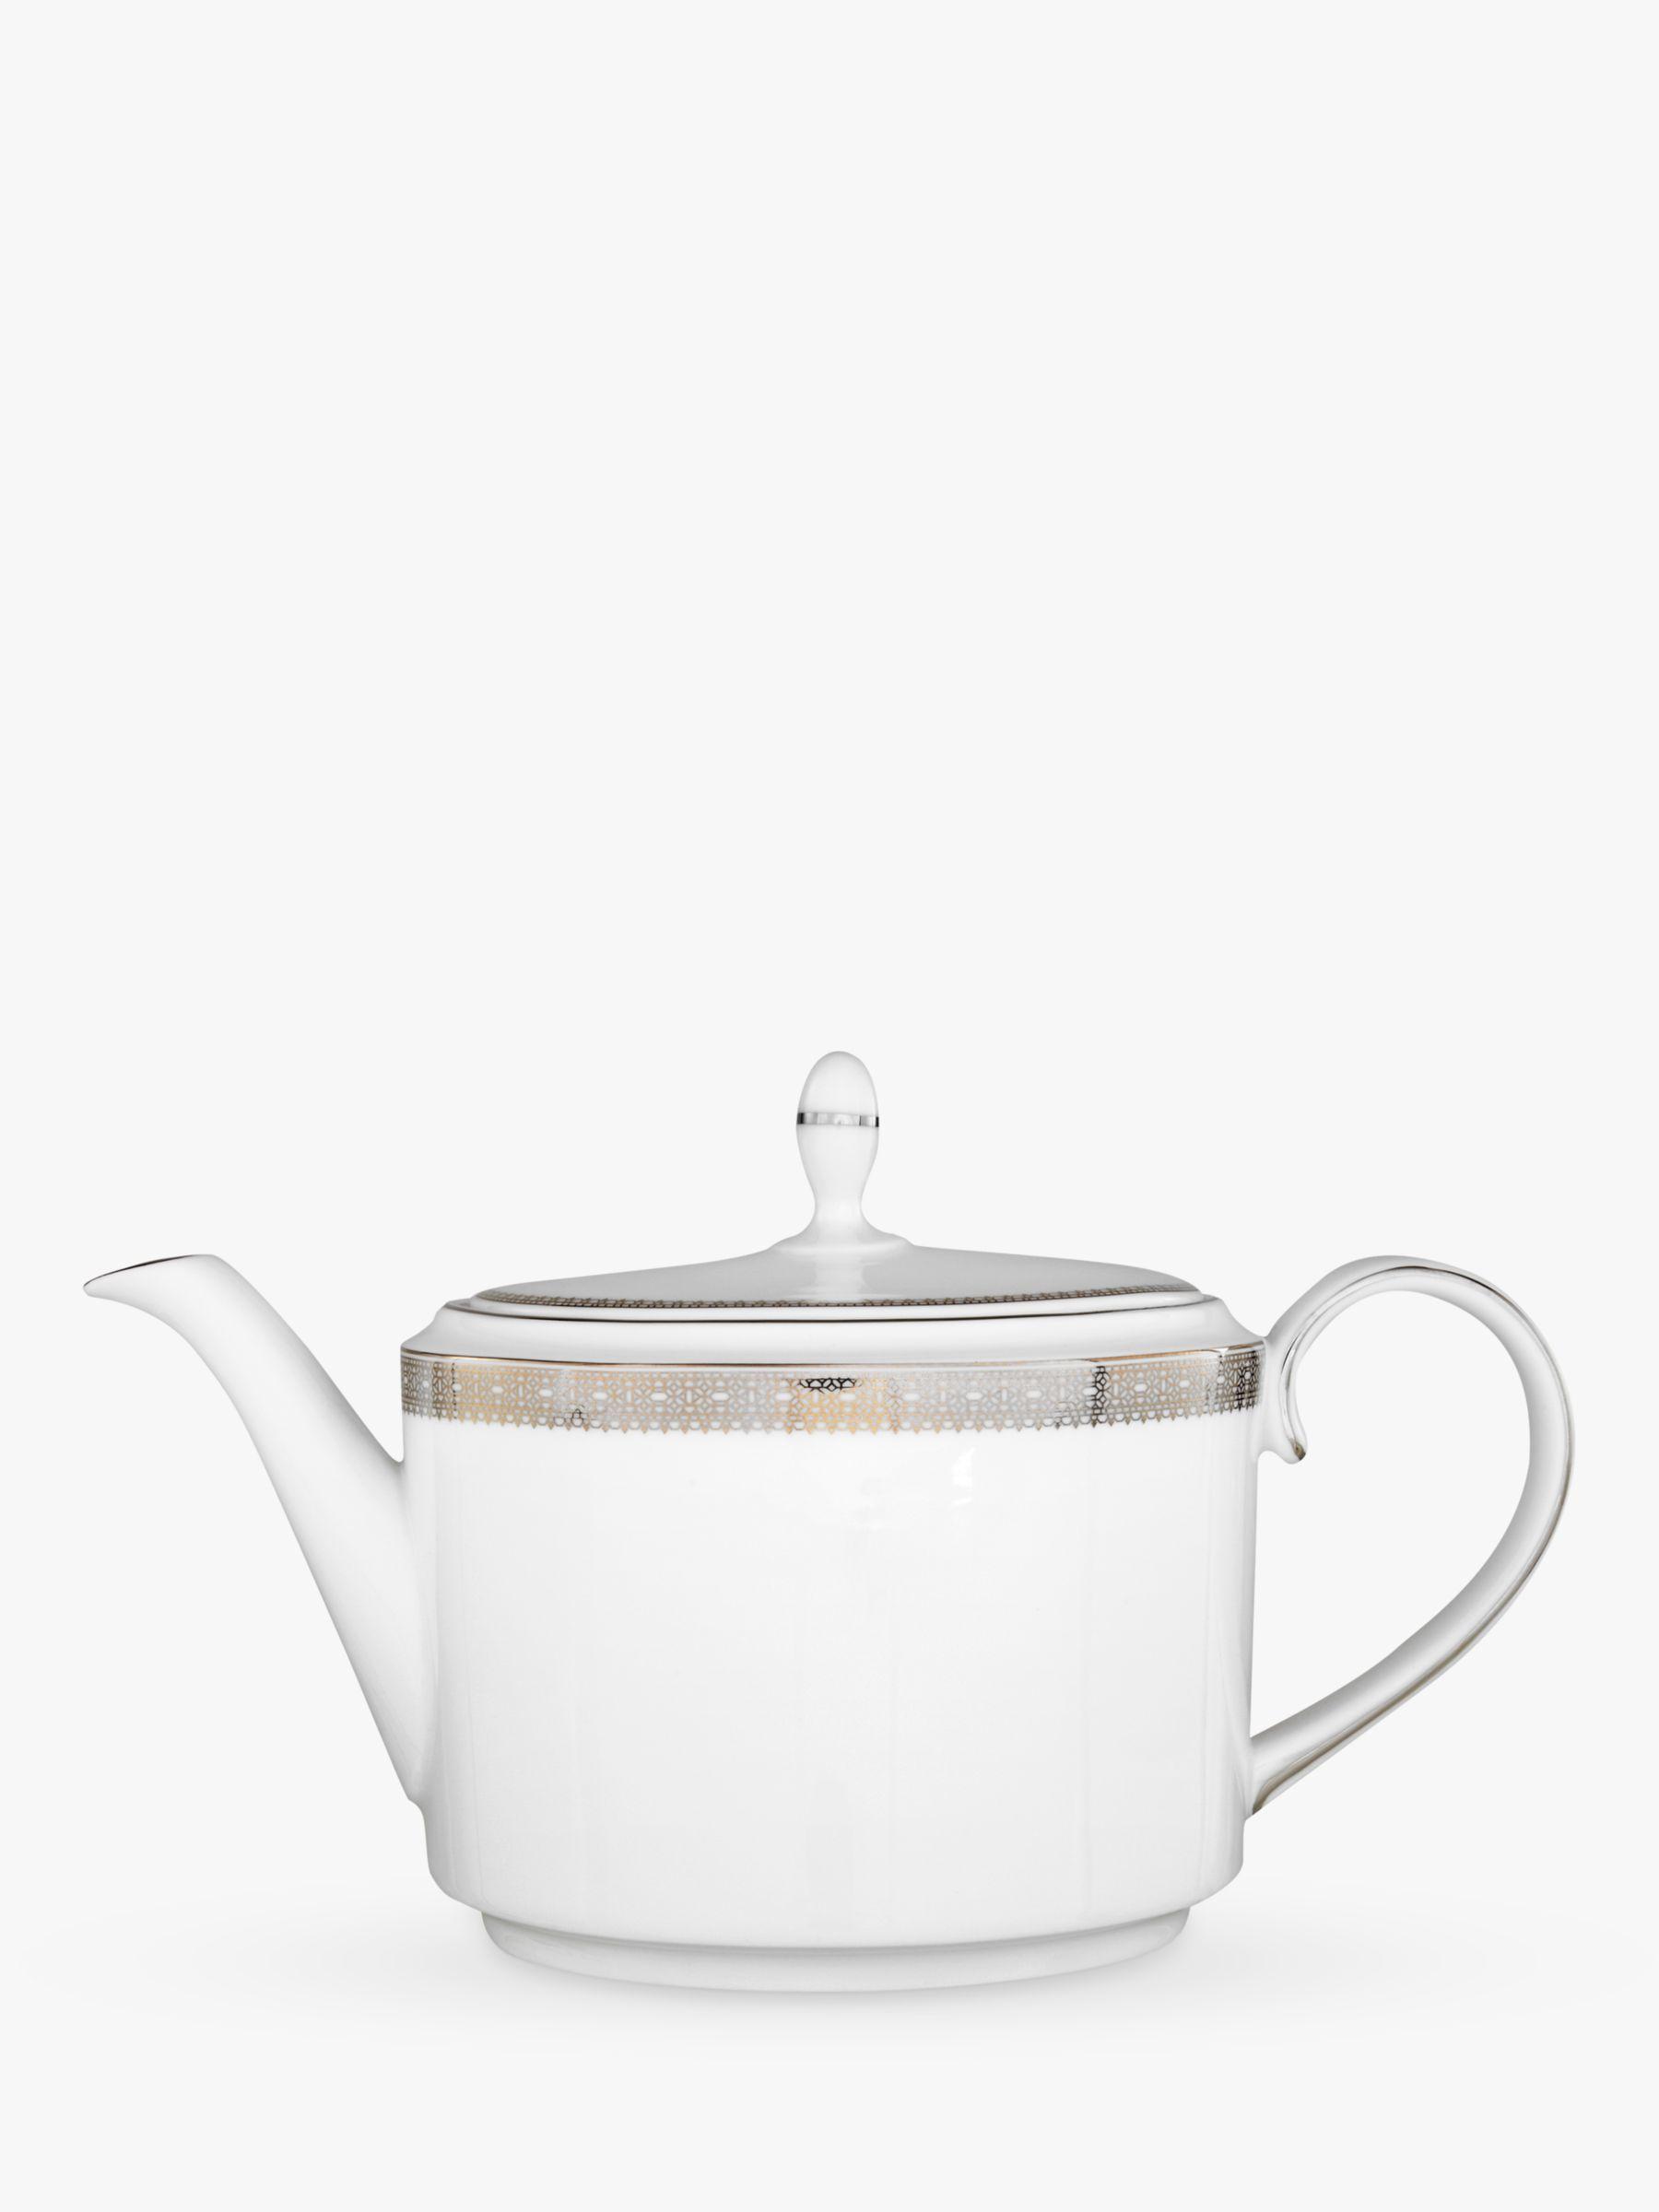 Vera Wang for Wedgwood Vera Wang for Wedgwood Lace Platinum Teapot, 1.1L